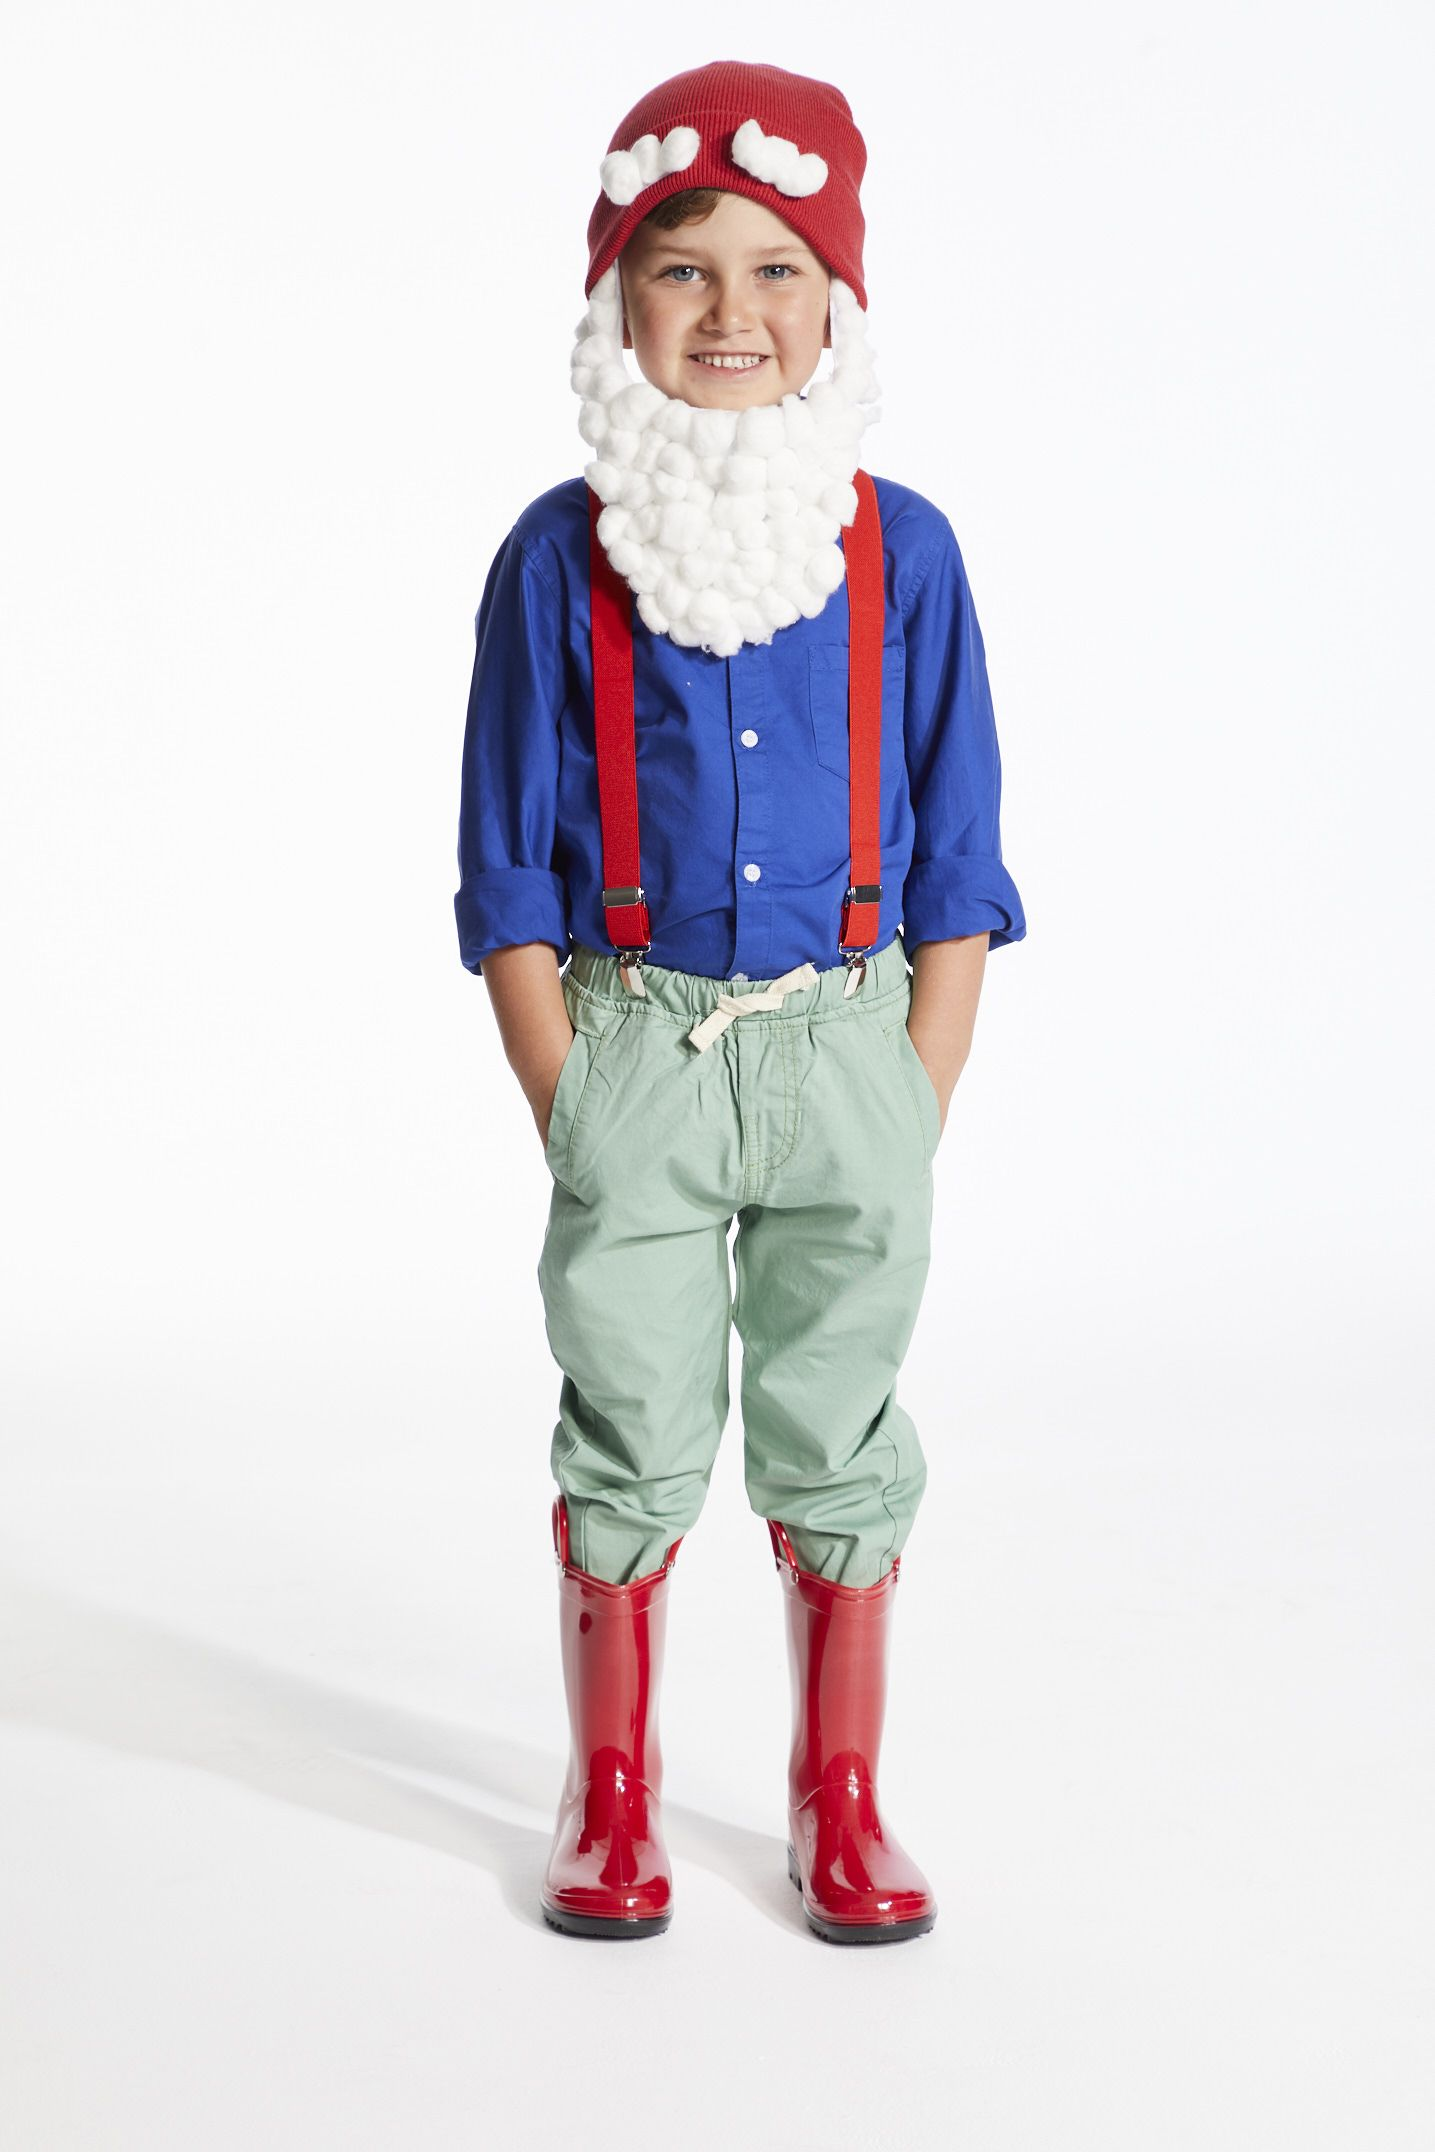 I/'m So Cute It/'s Scary Halloween Boys Girls Kids Childrens T-Shirt